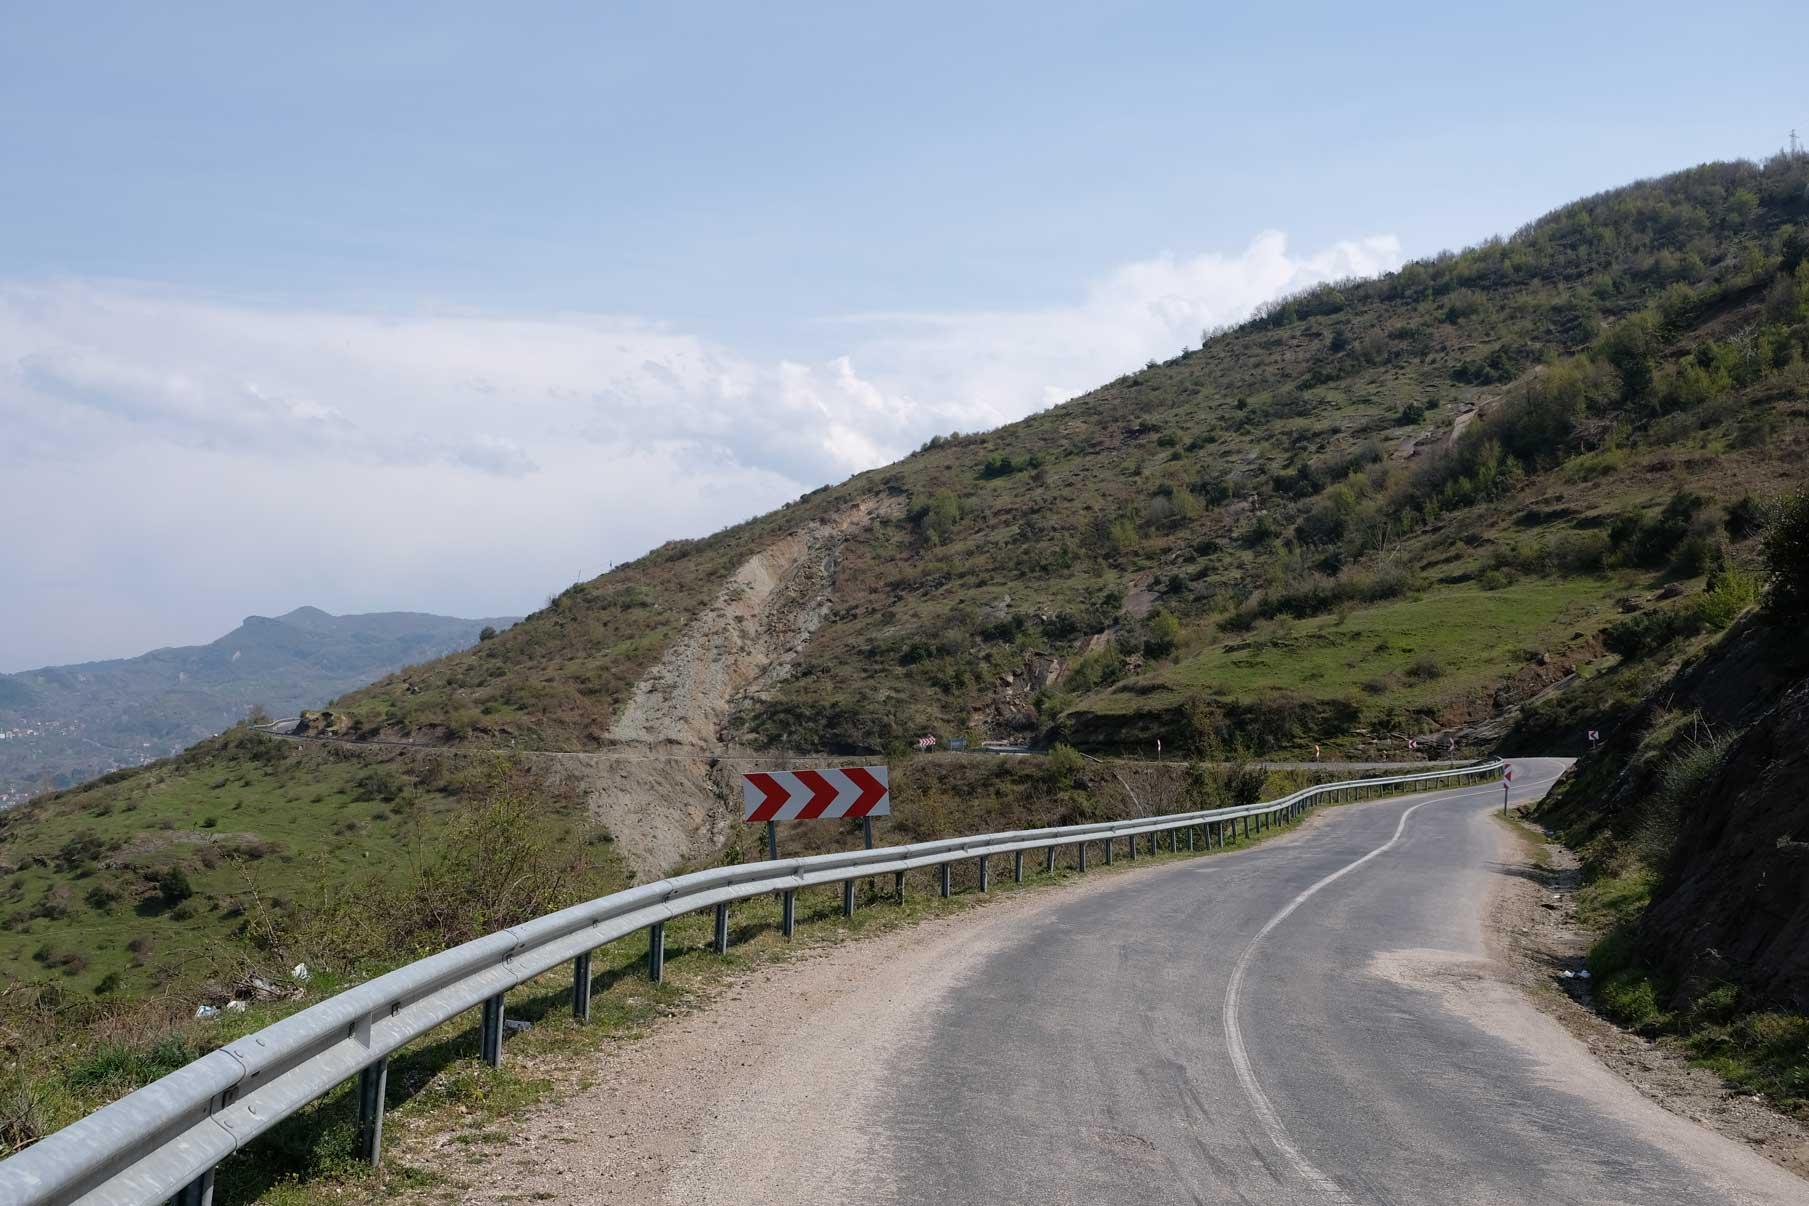 Kurvige Straße